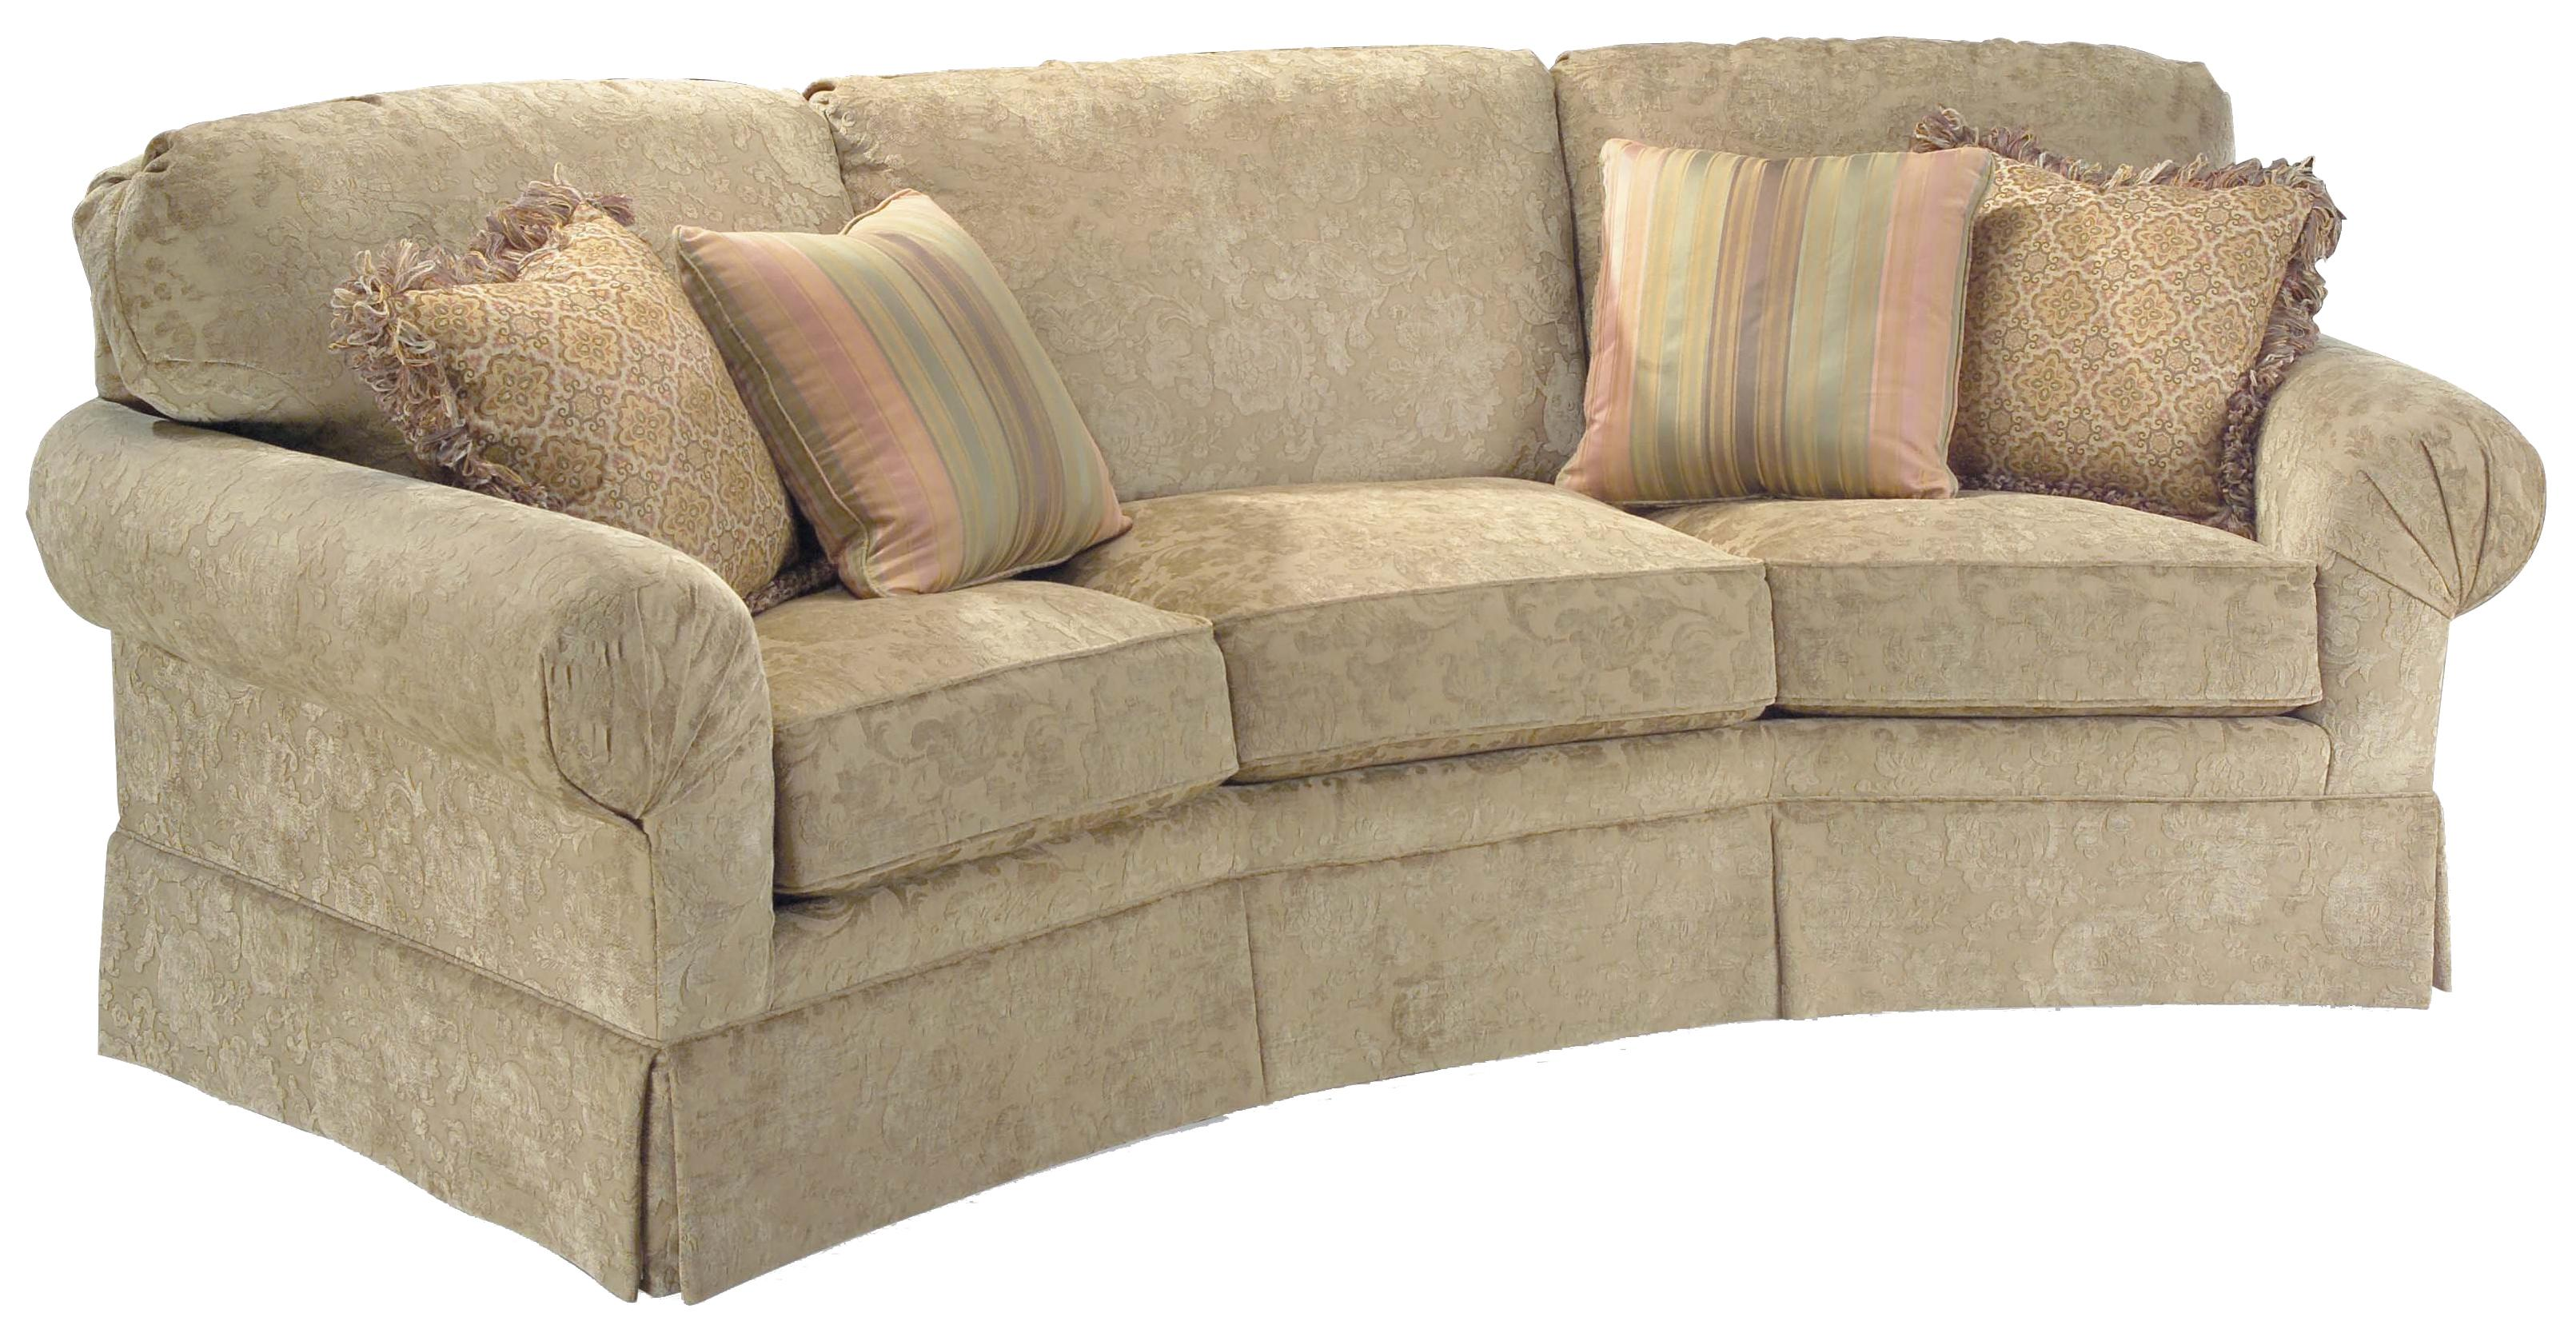 3766 Corner Sofa by Fairfield at Belfort Furniture